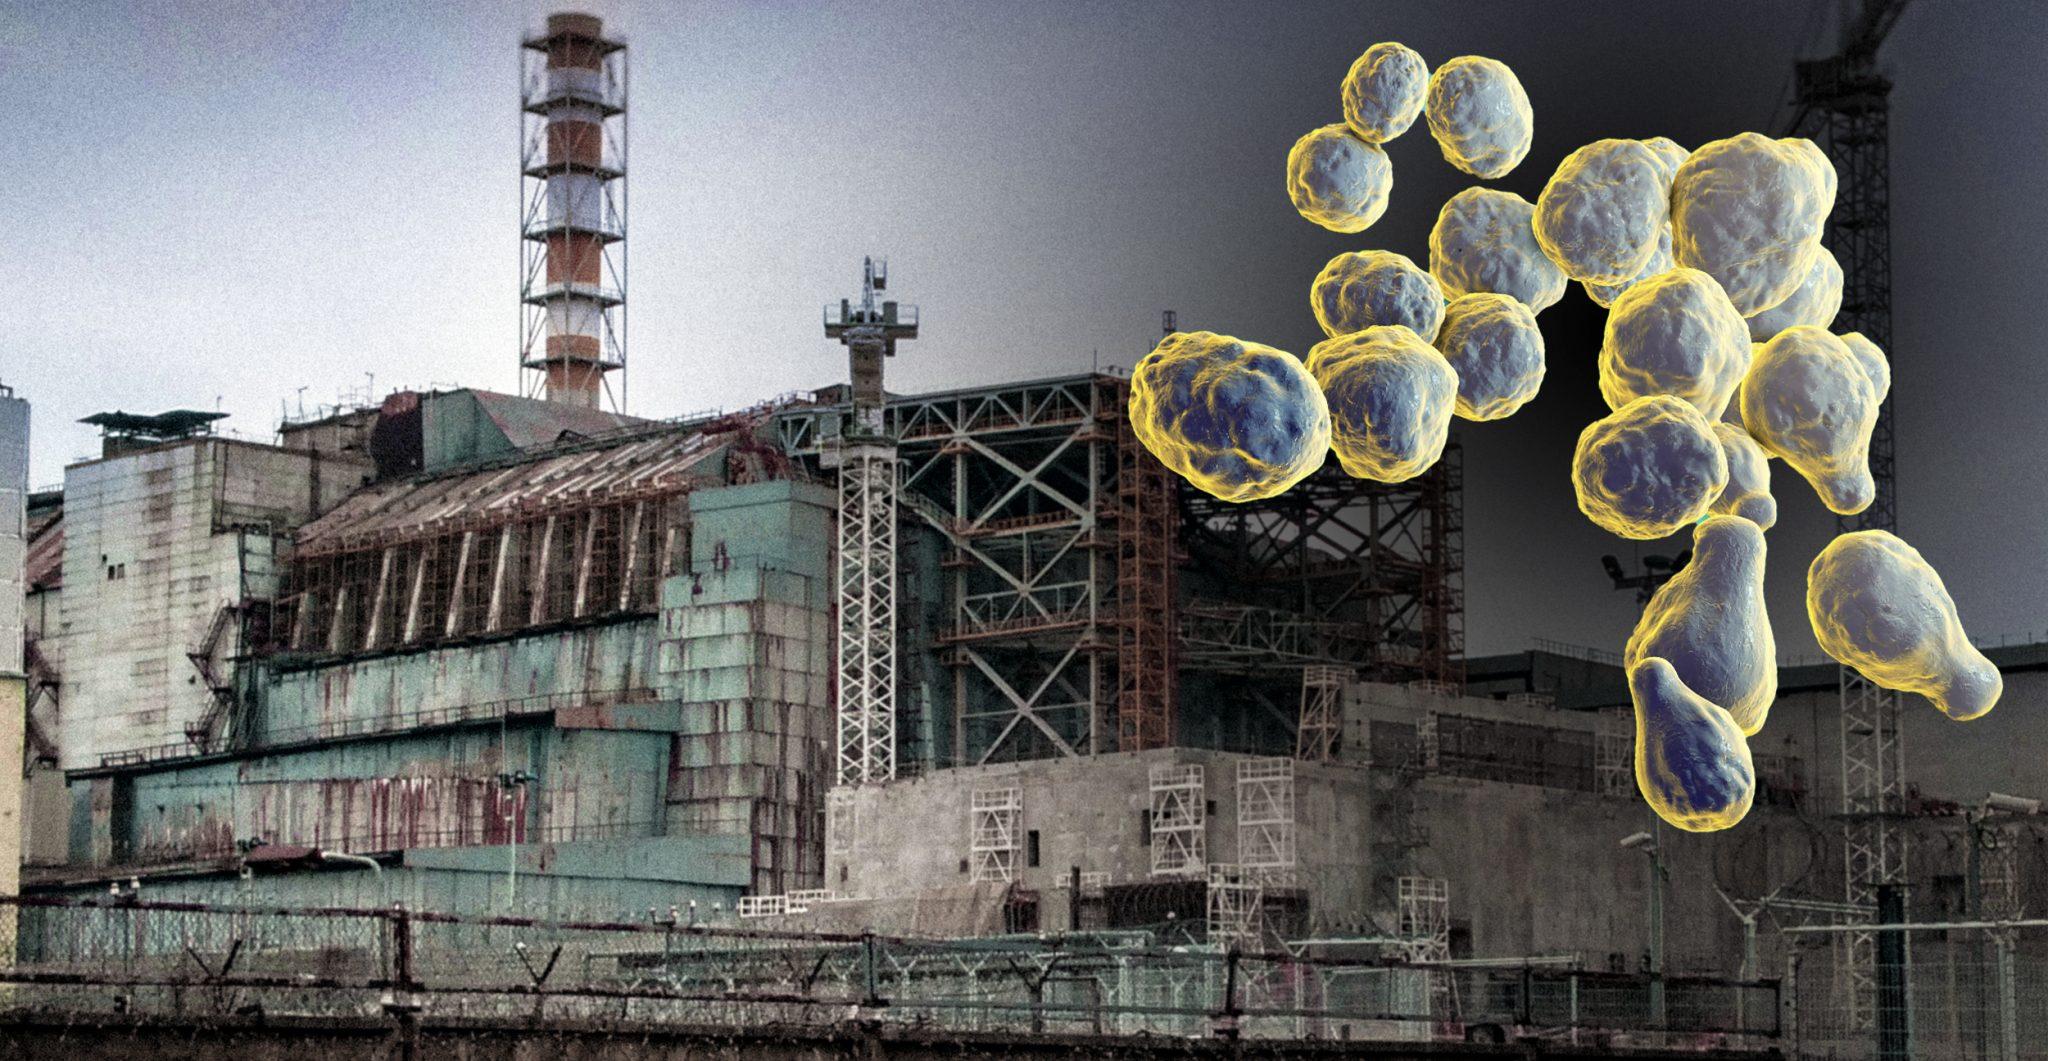 Fungi on Chernobyl